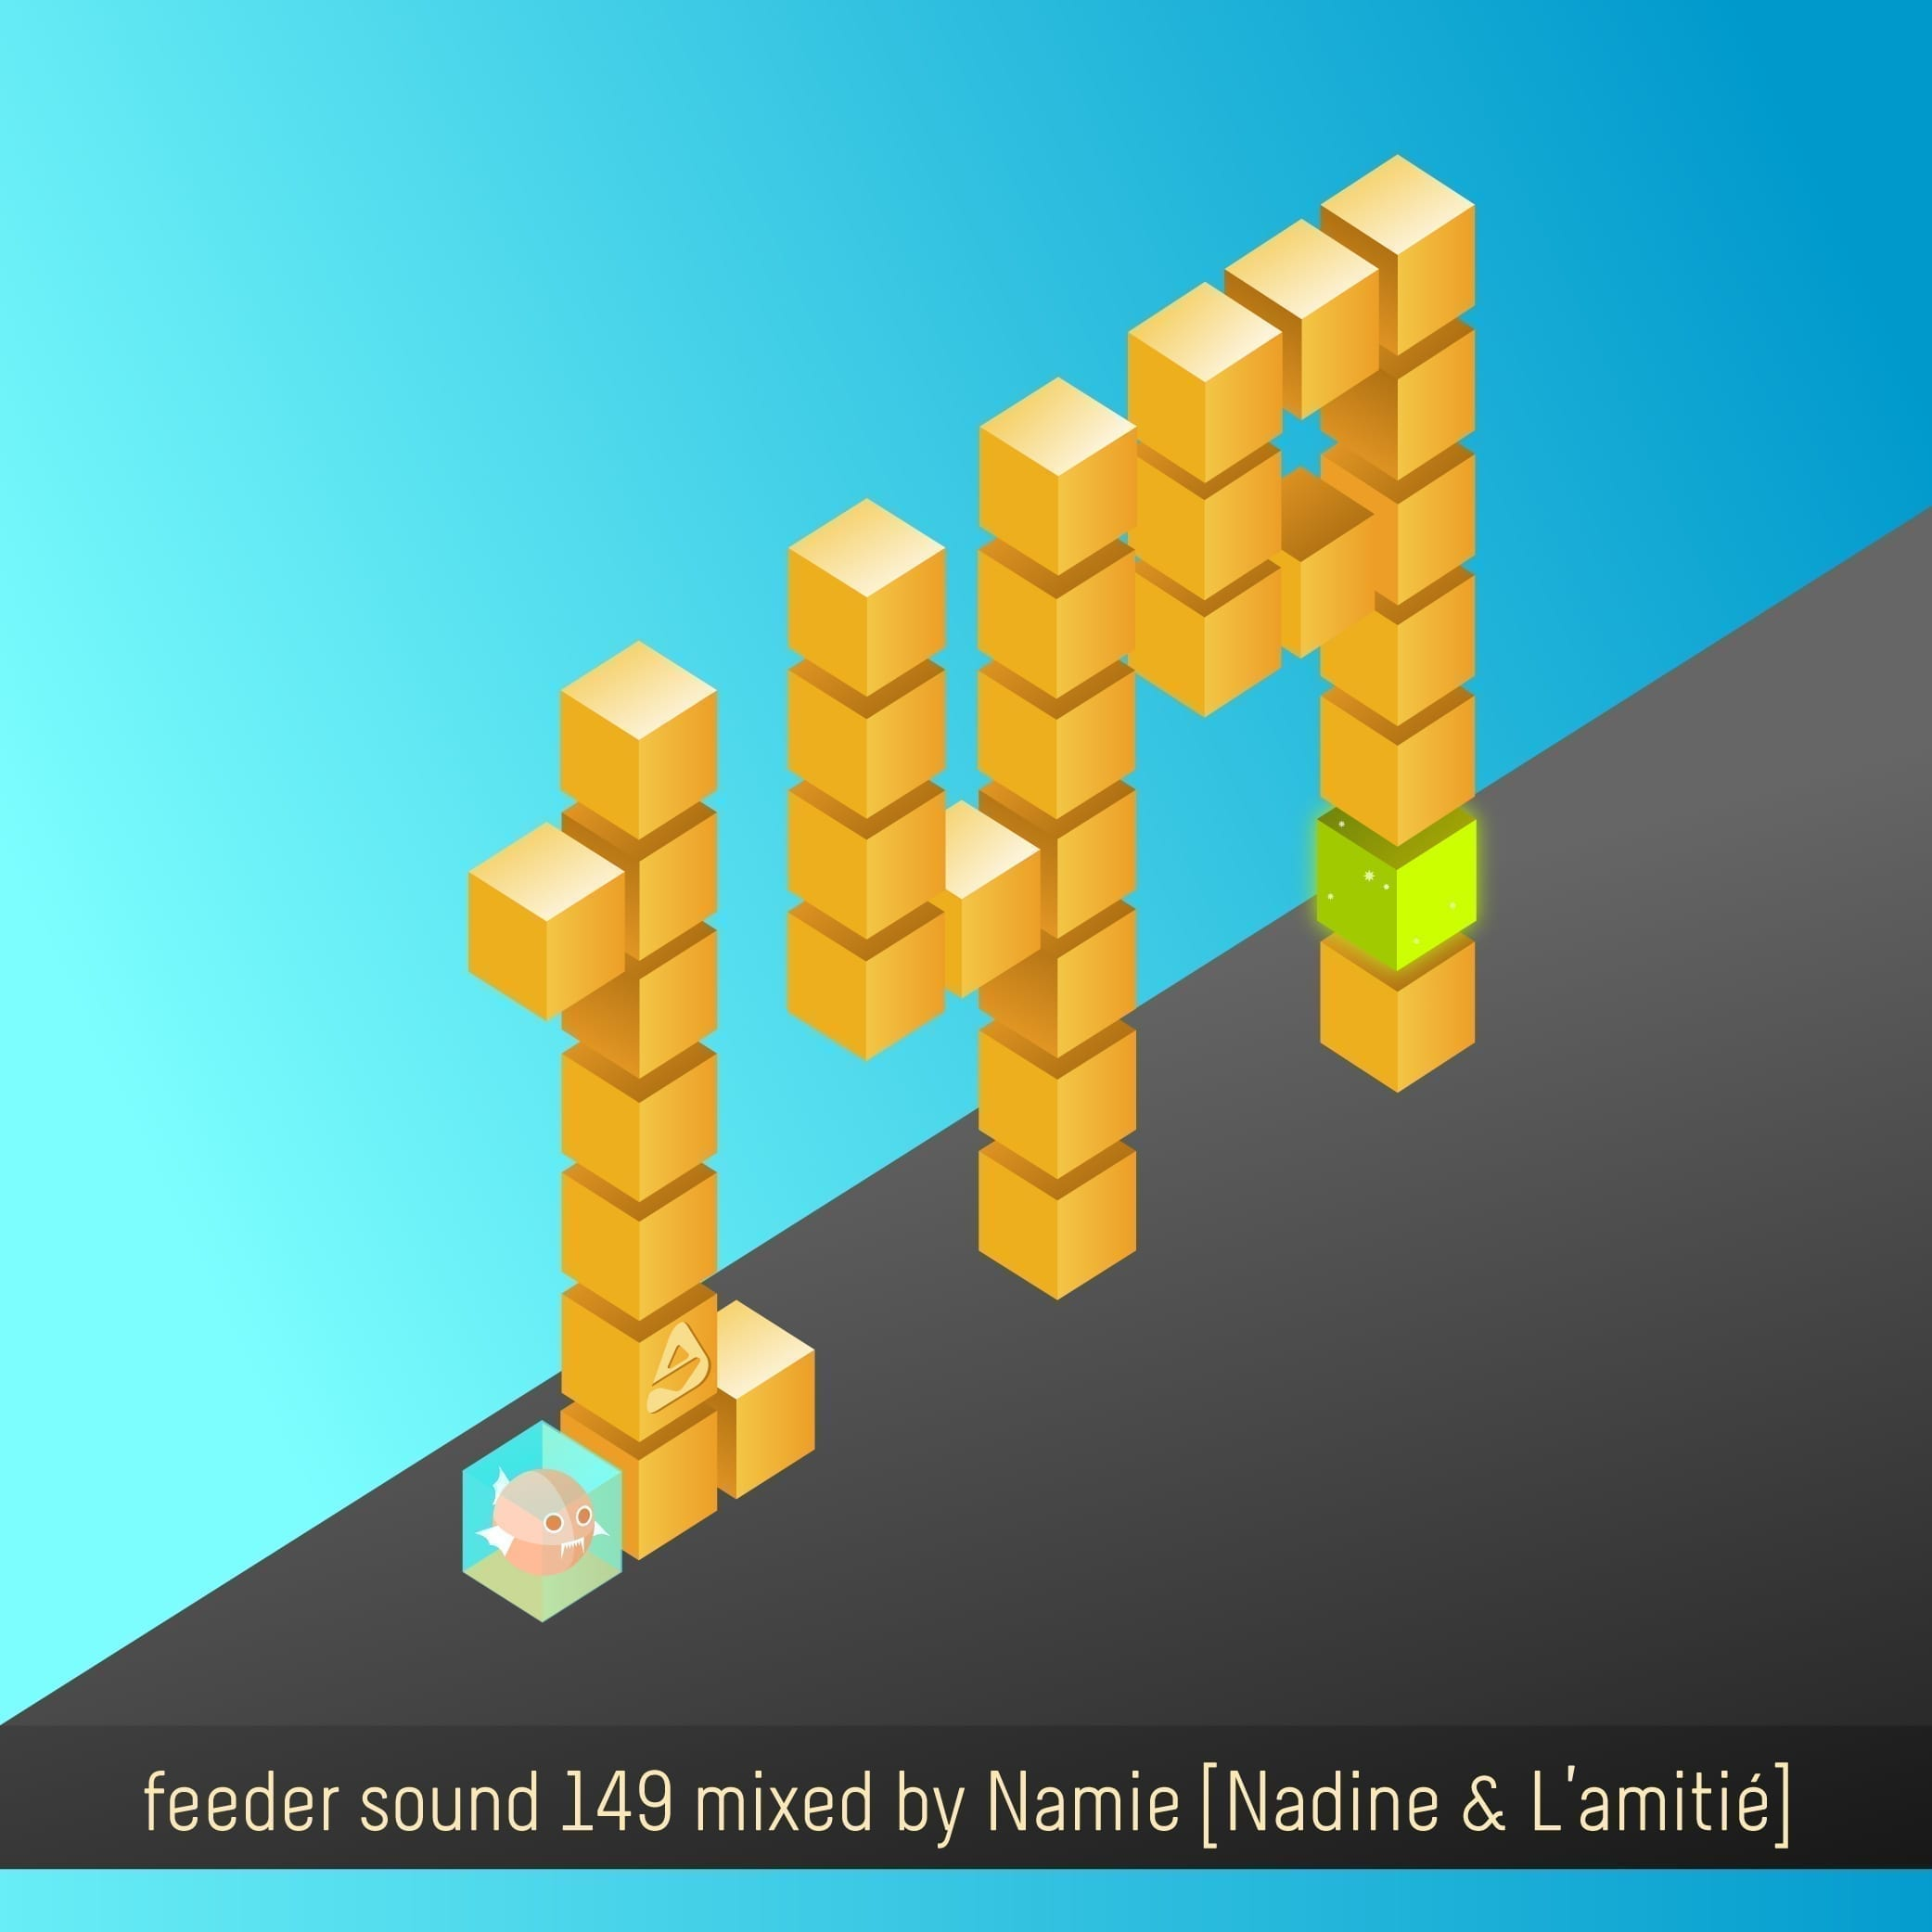 feeder sound 149 mixed by Namie (Nadine & L'amitié)